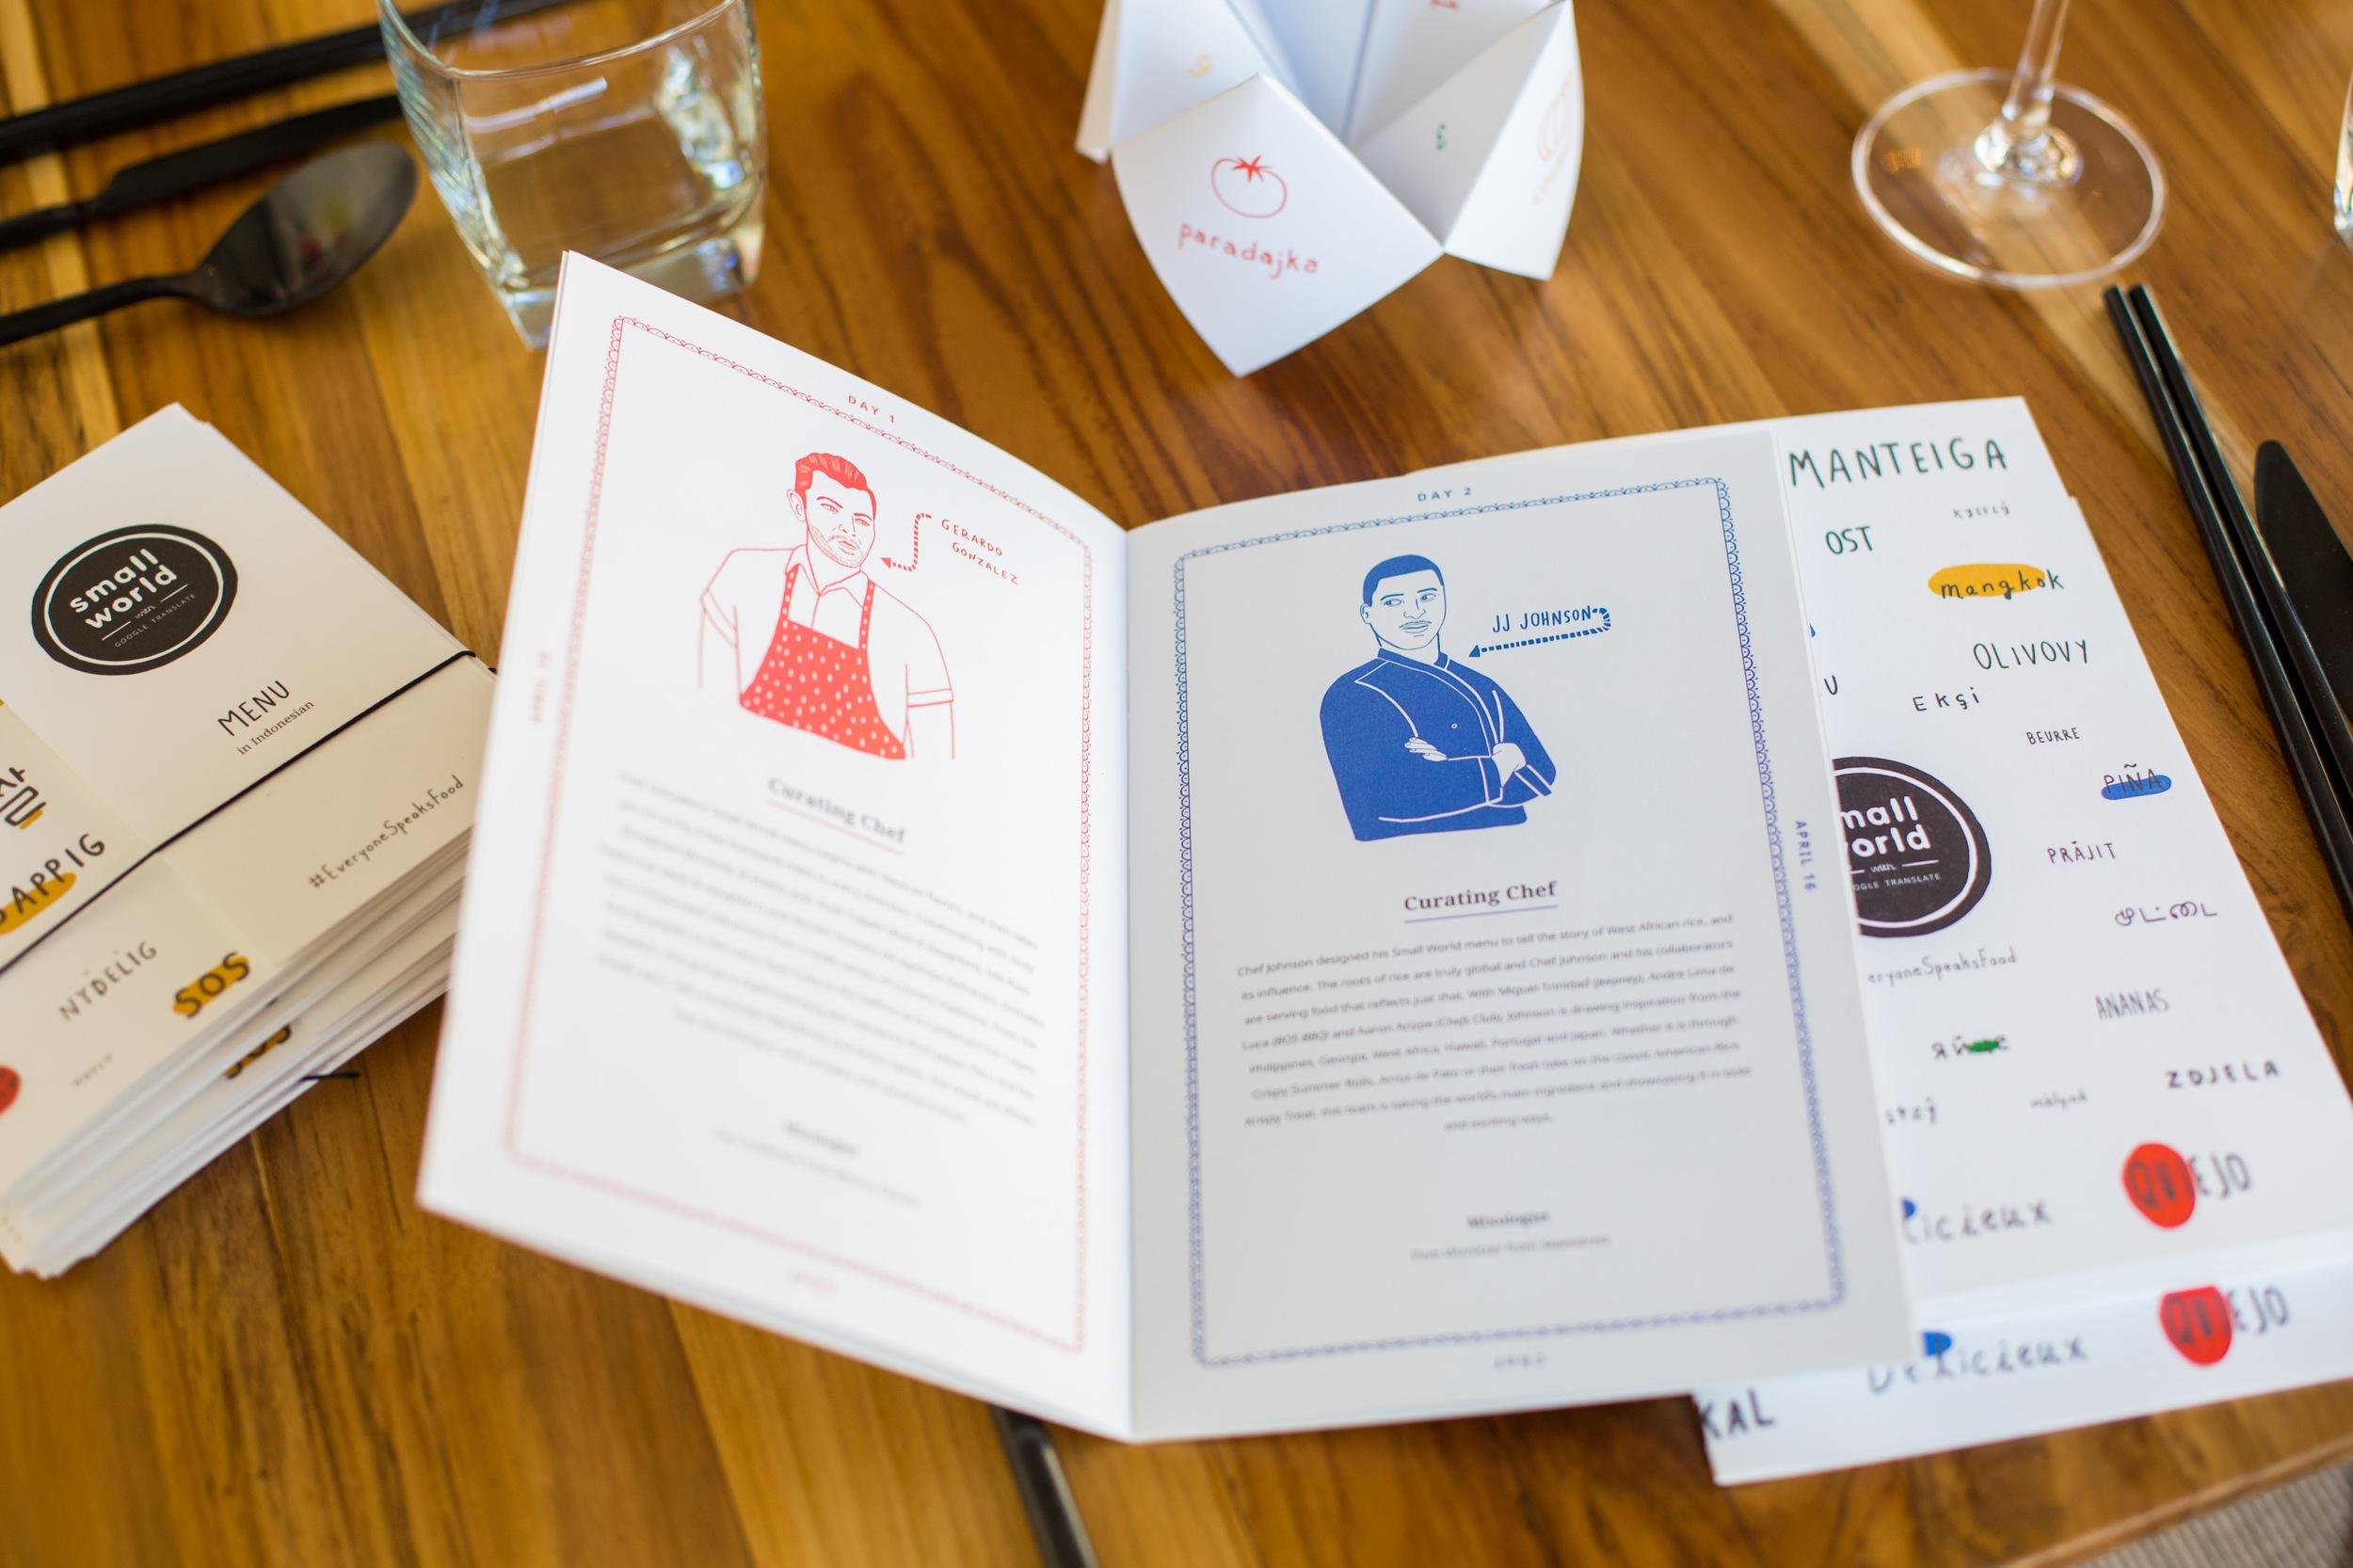 Chef Illustrations and Menu // Photo by Margarita Corporan